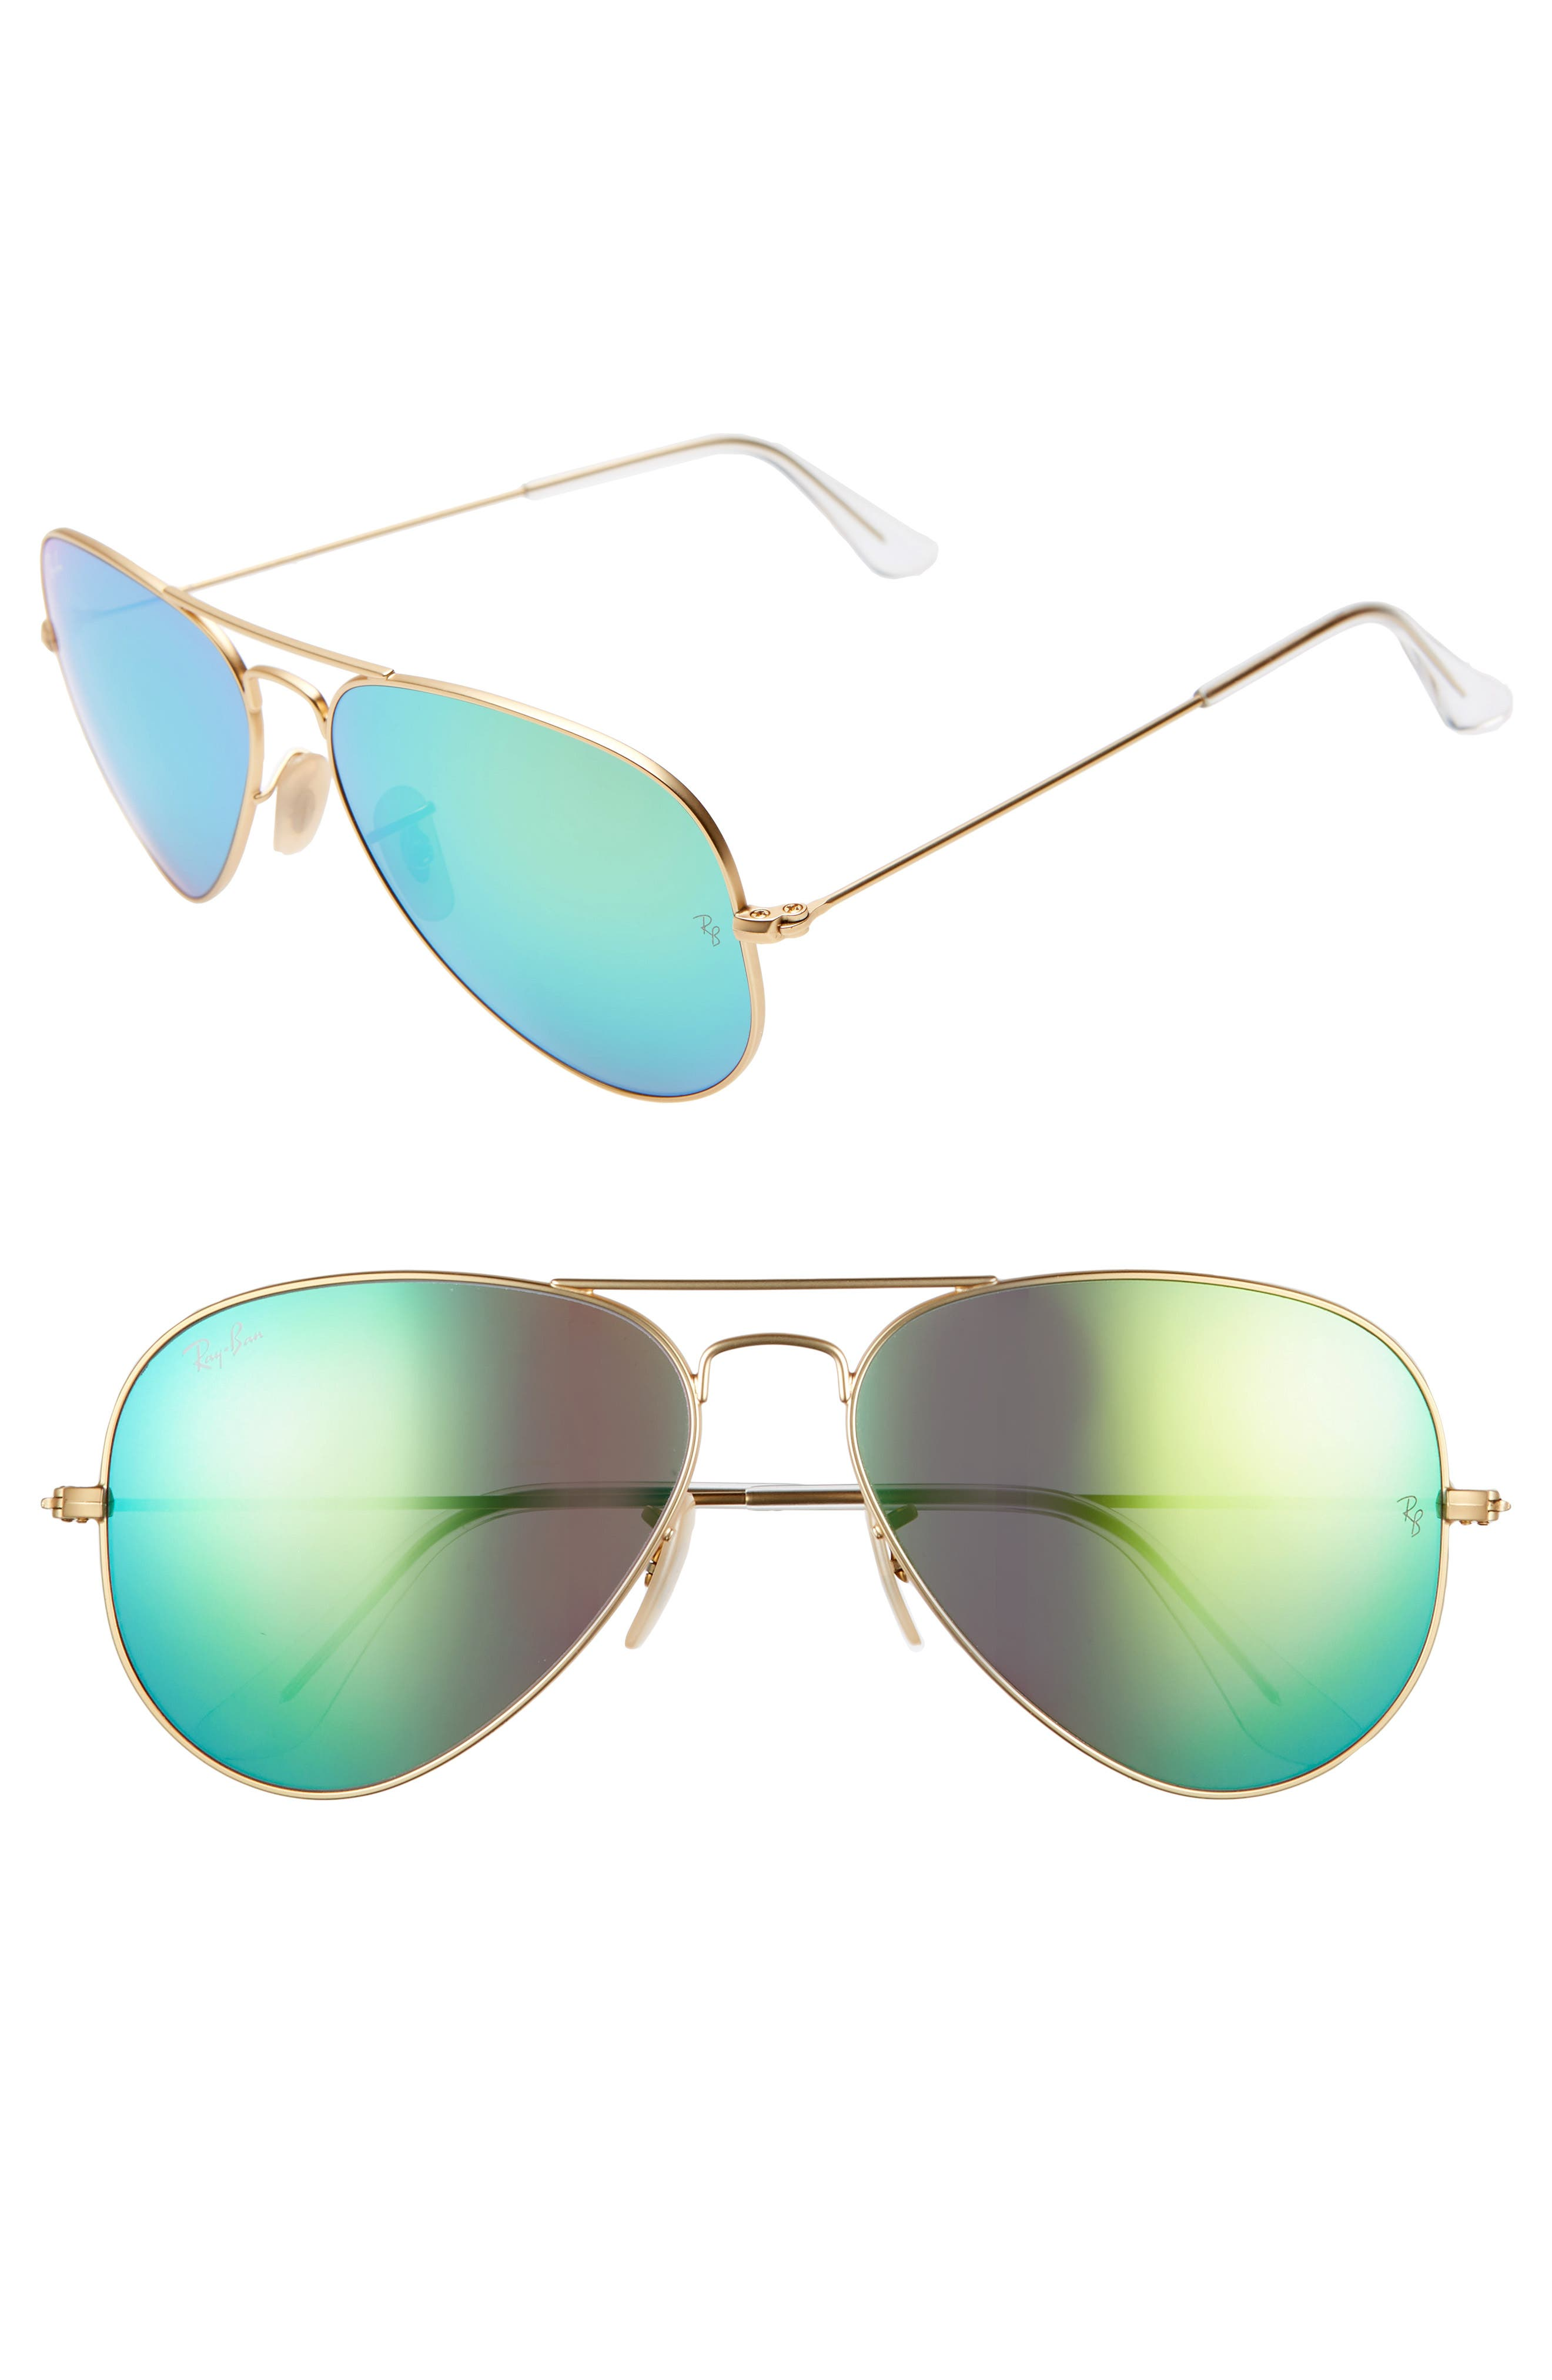 8bfe7b00345cc Ray-Ban 5m Mirrored Aviator Sunglasses - Gold  Green Flash Mirror